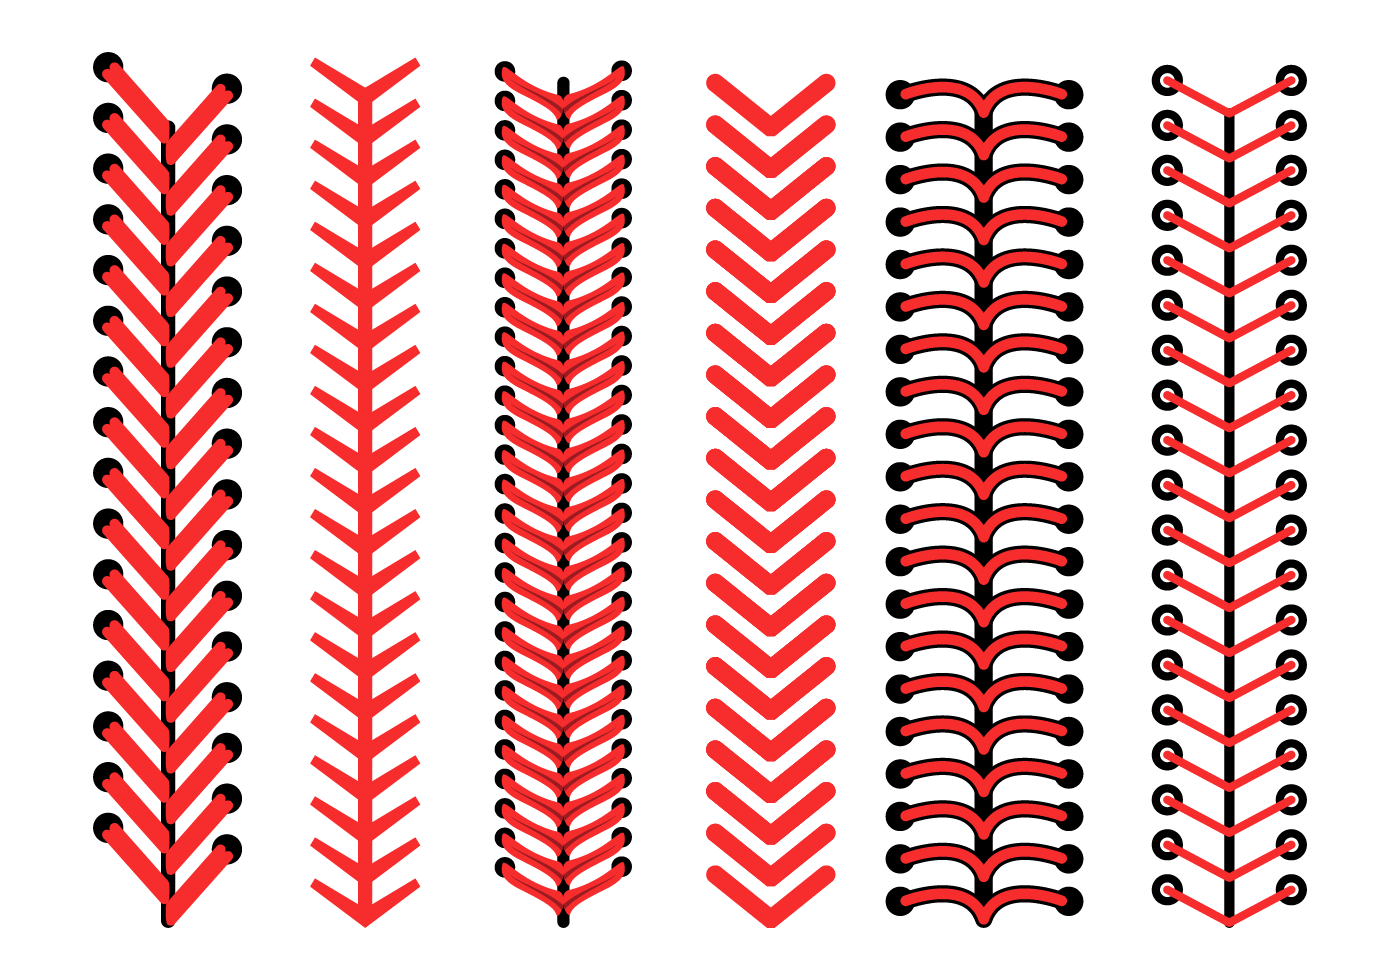 Pin By Bedriye Yilmaz On S ѕiinsyette ϲames Vector Art Design Decal Printer Vector Art